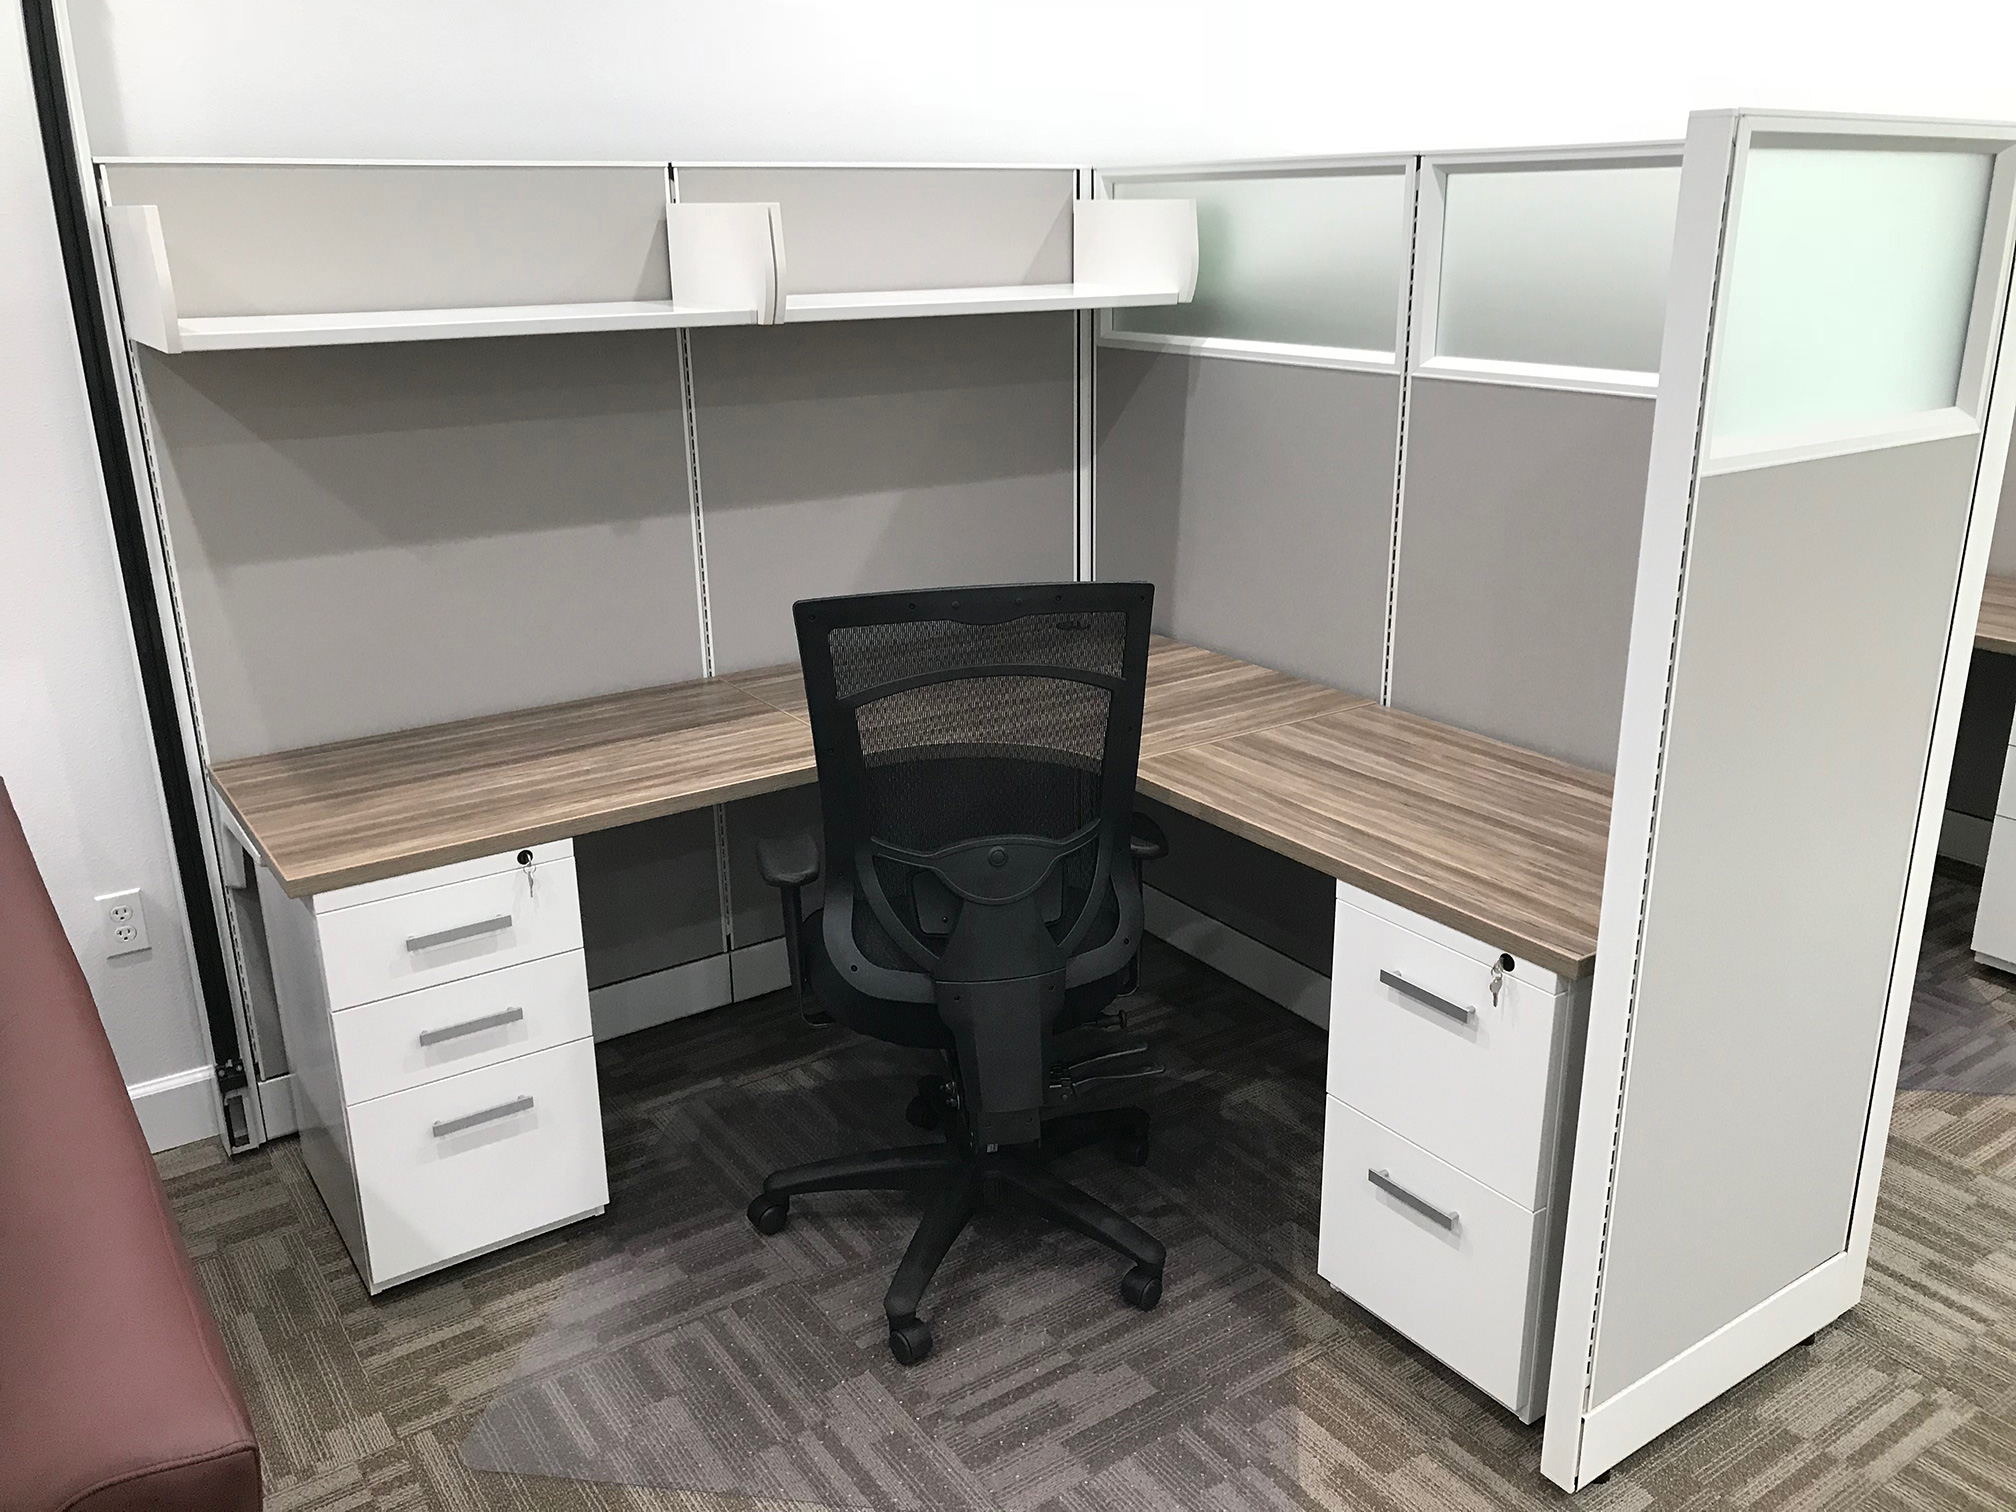 office-cubicle-installation-manasota-office-supplies-llc.jpg